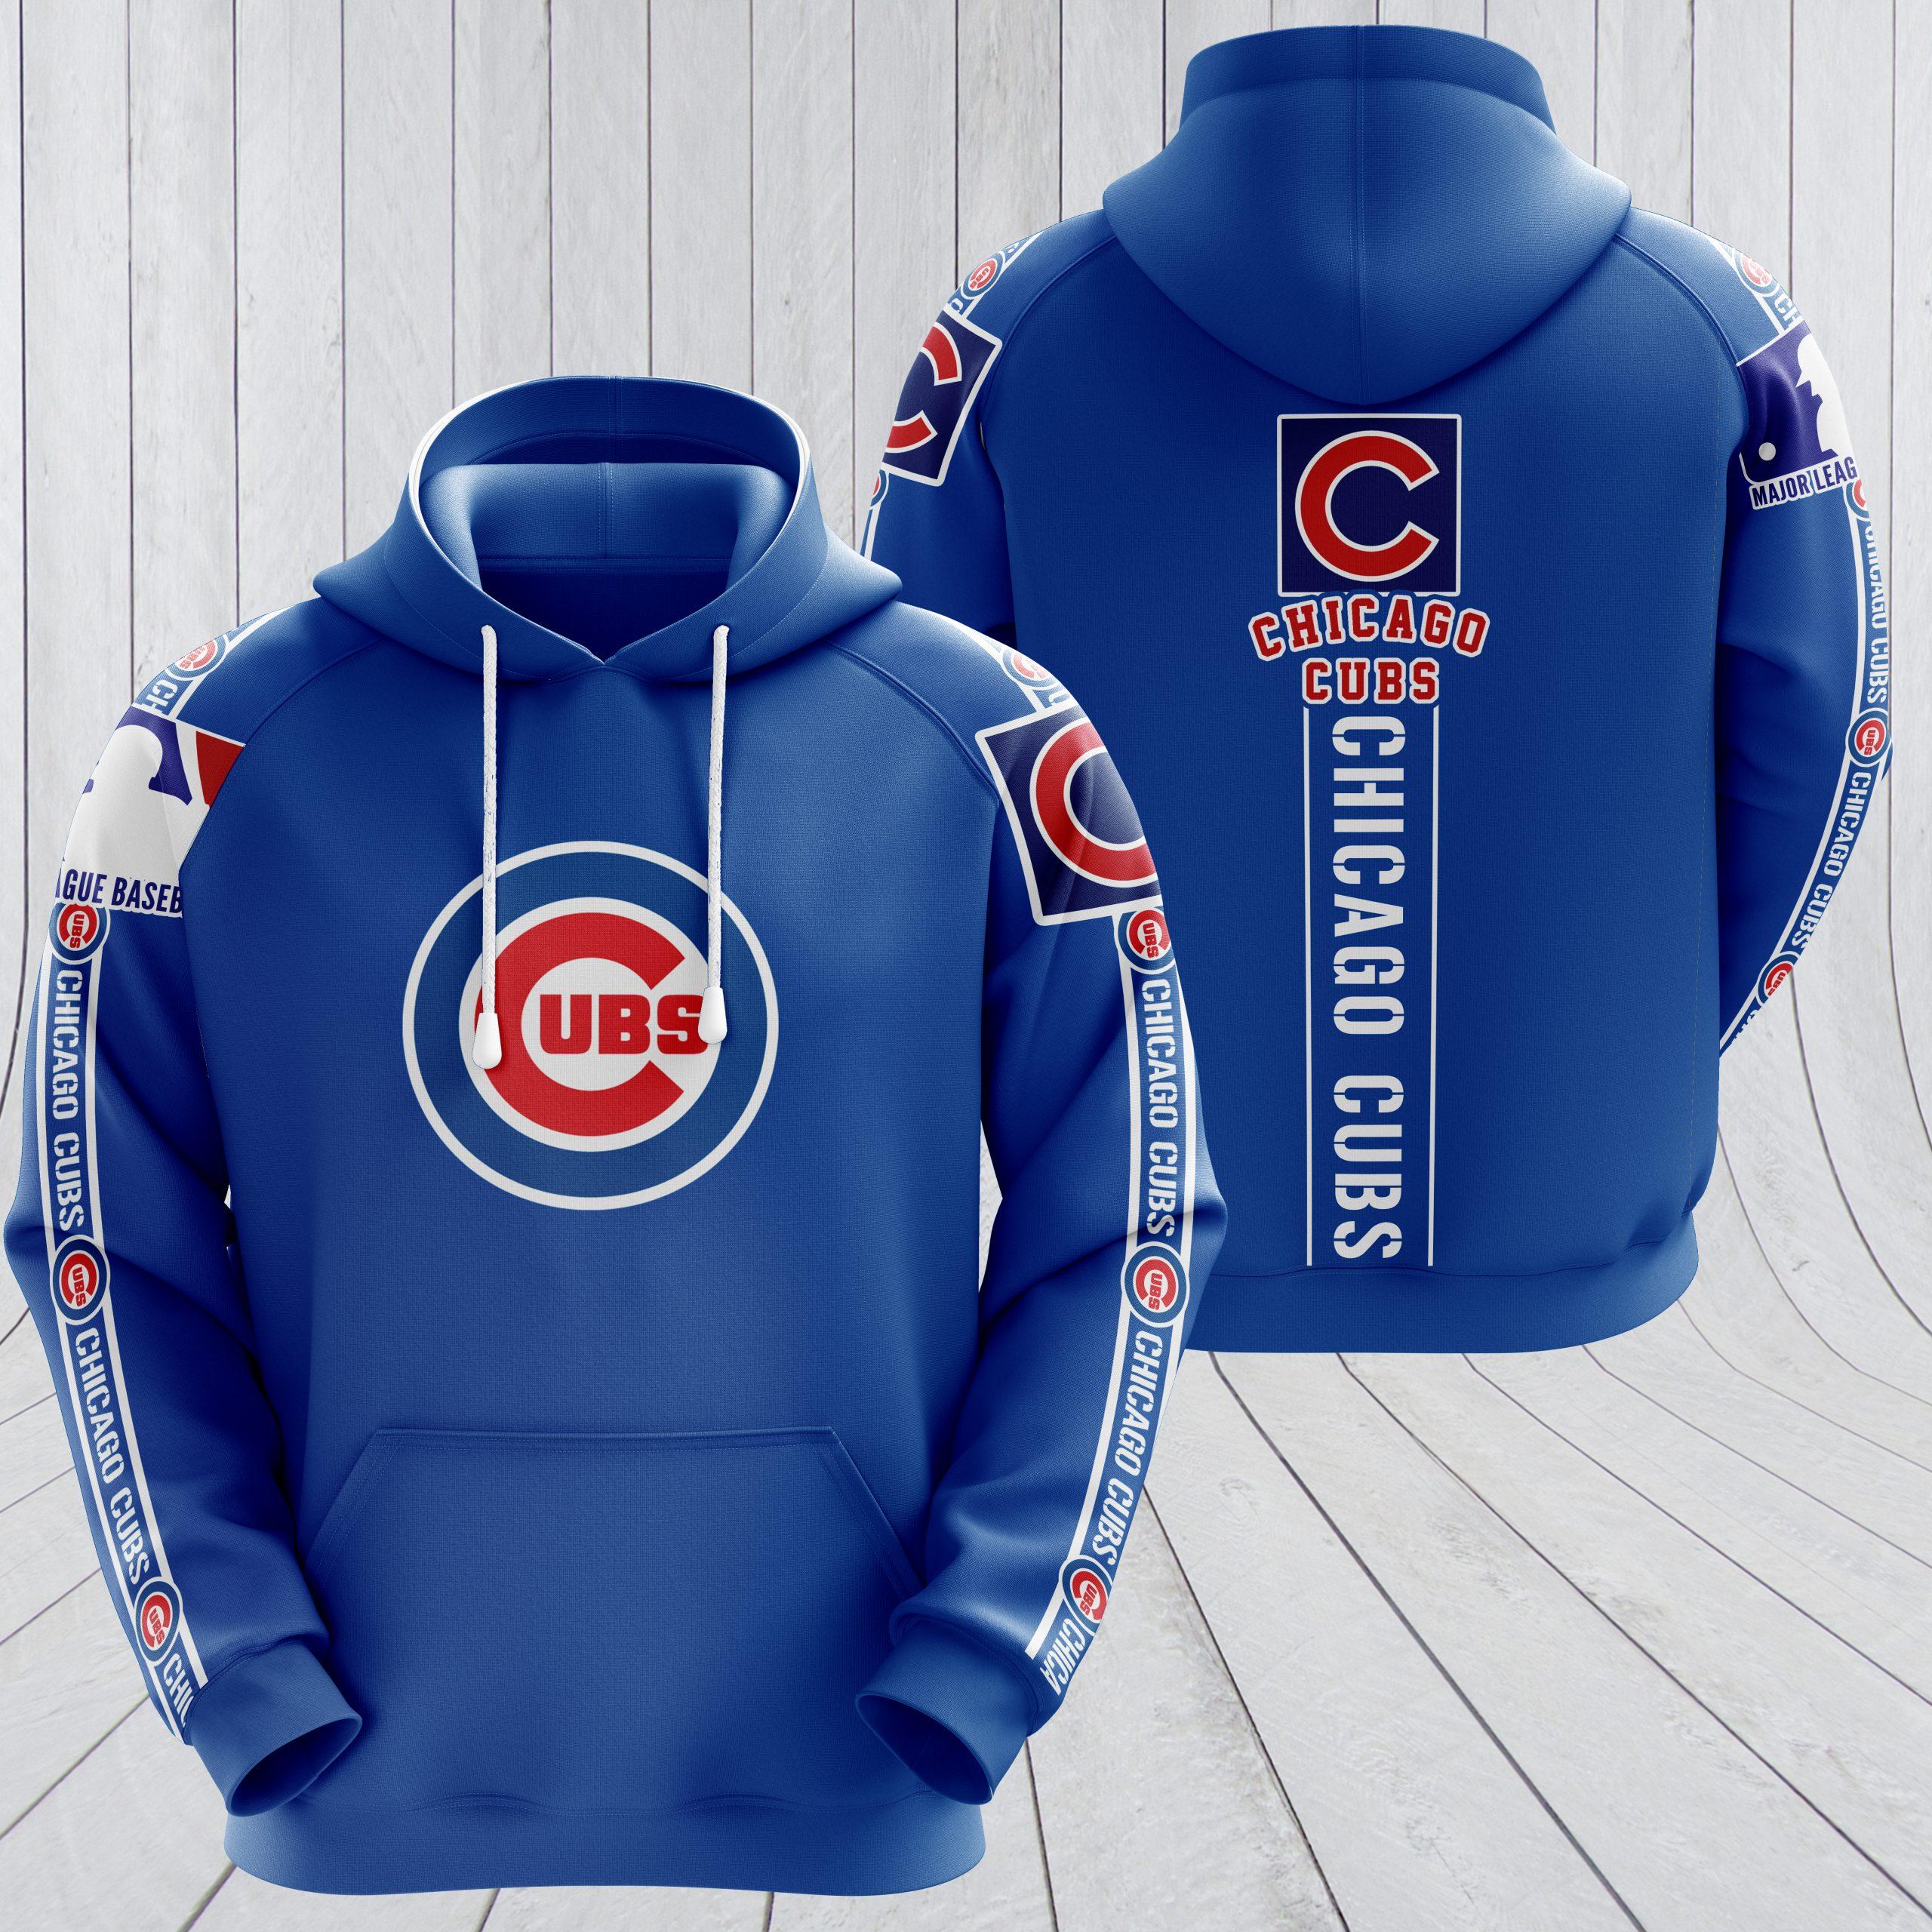 MLB chicago cubs full printing hoodie - royal